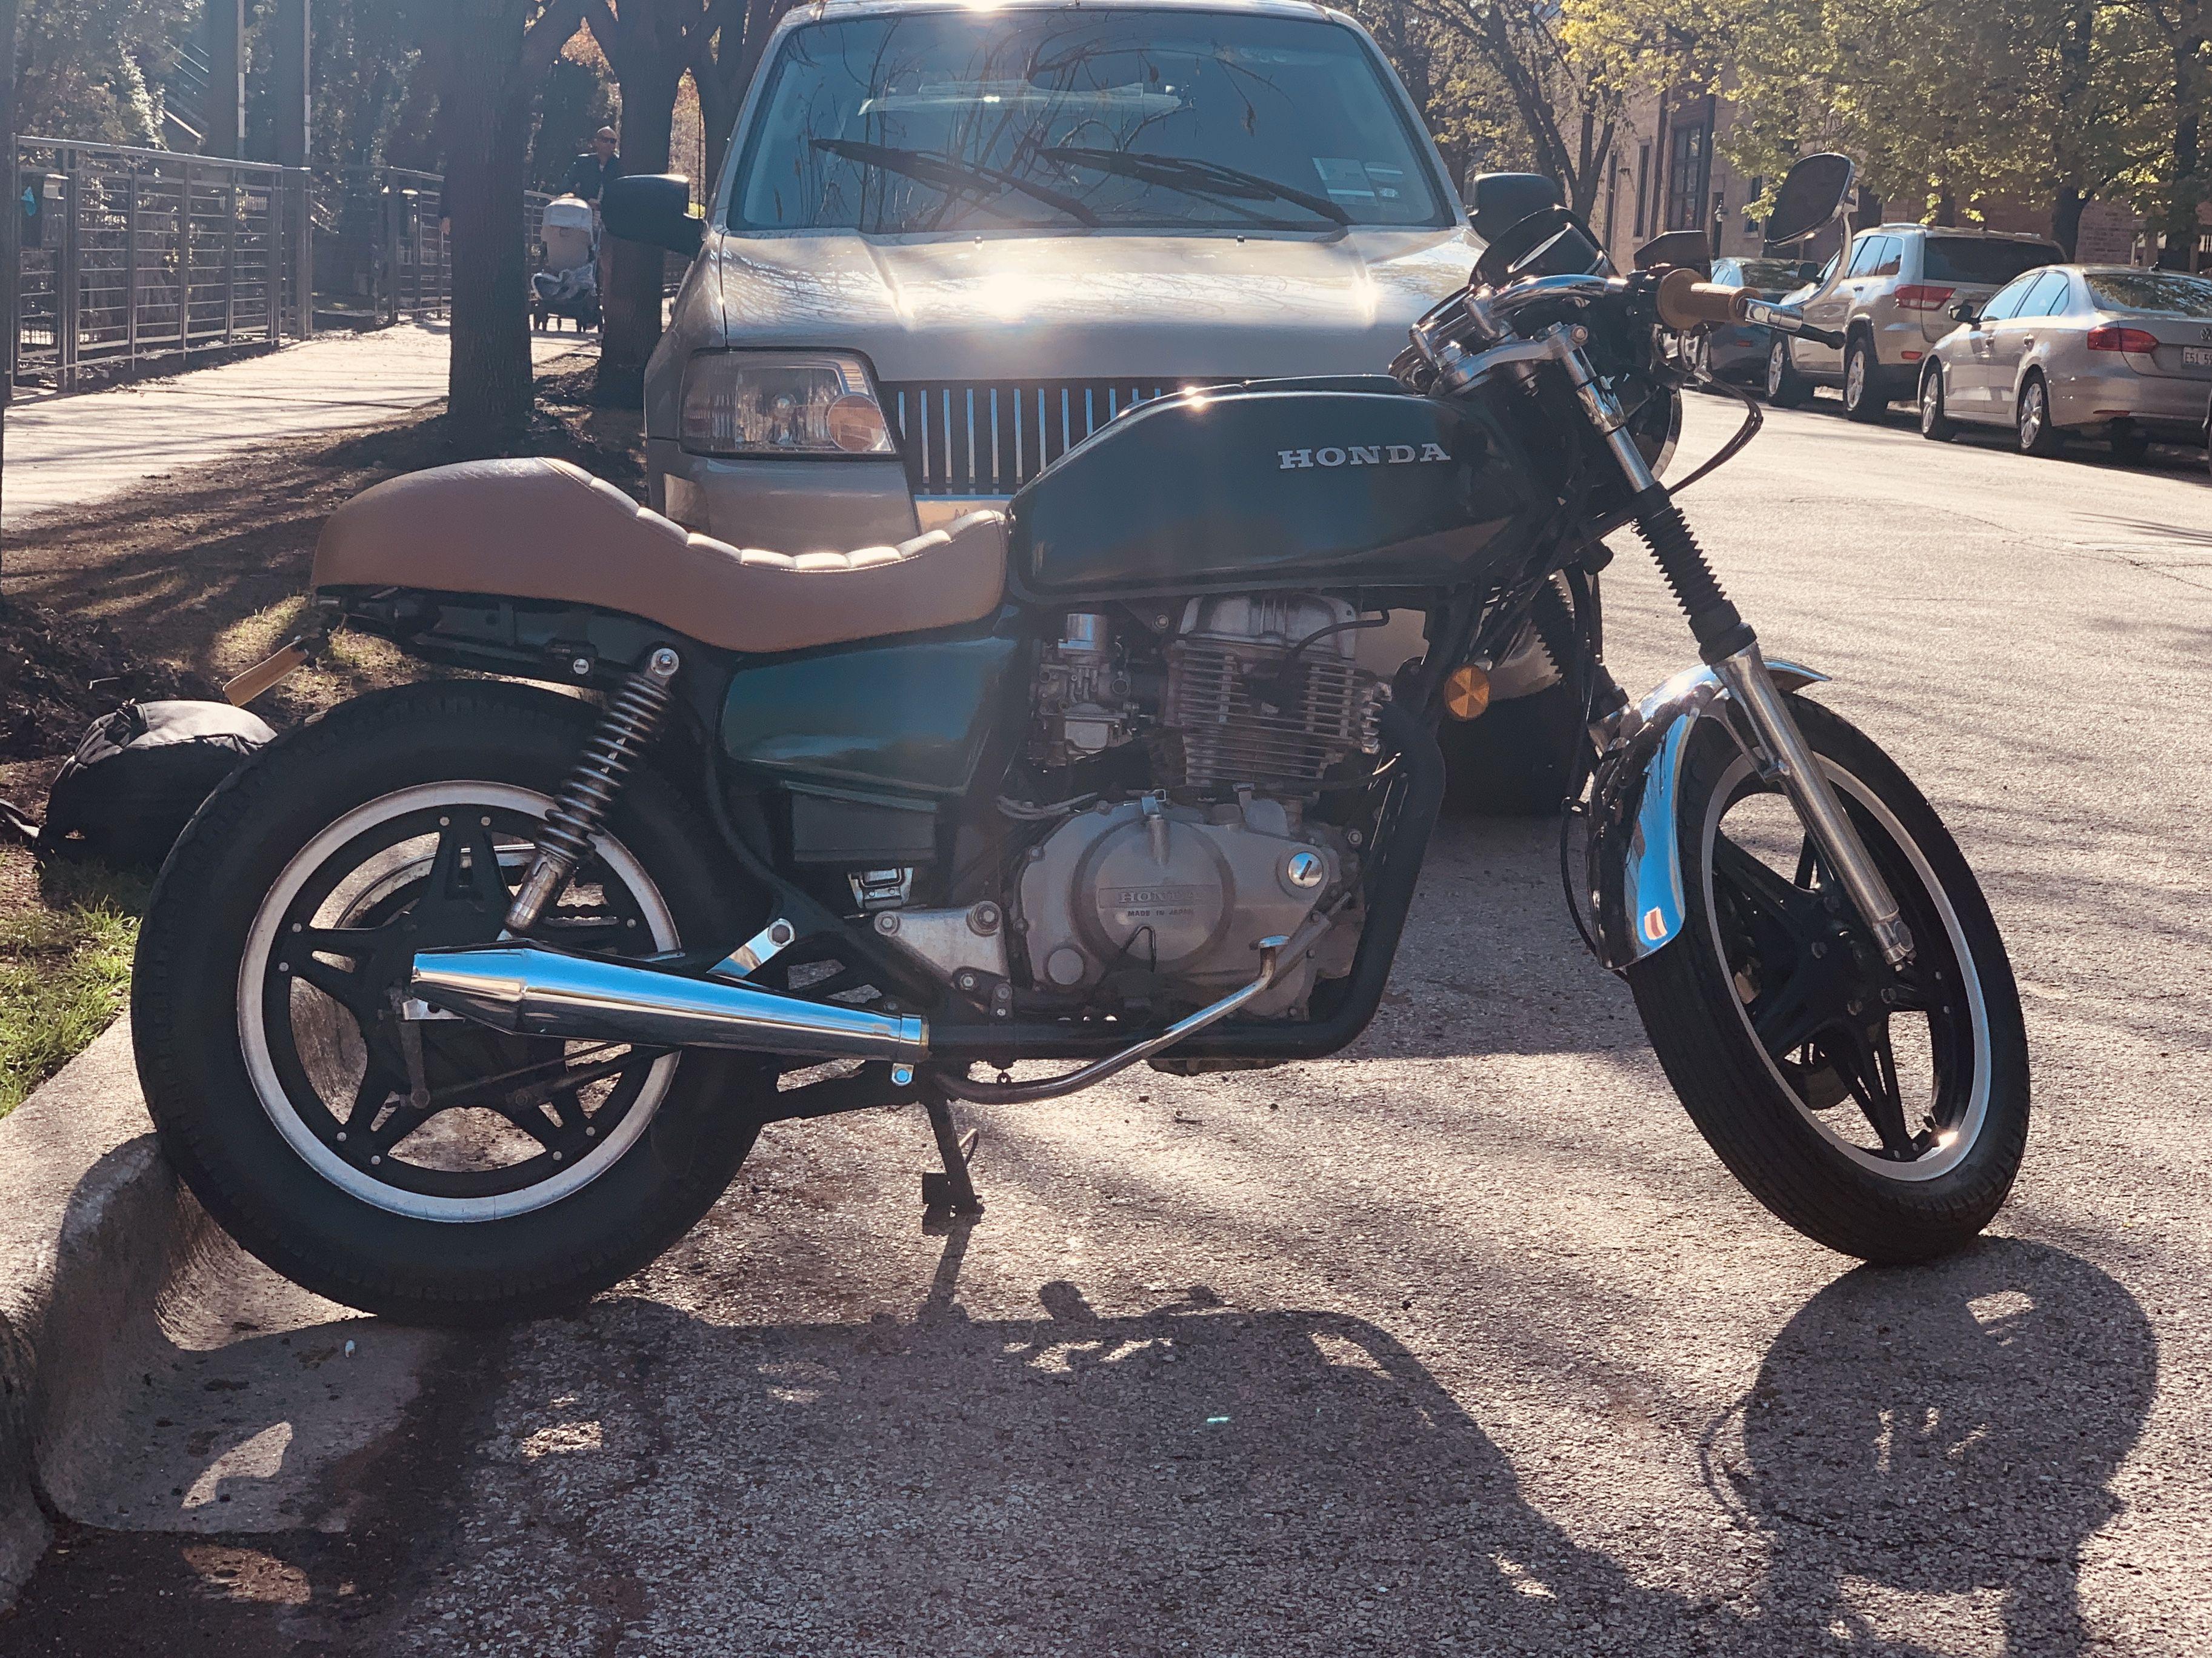 1980 Honda Cm400t Honda Bike Moped [ 2736 x 3650 Pixel ]